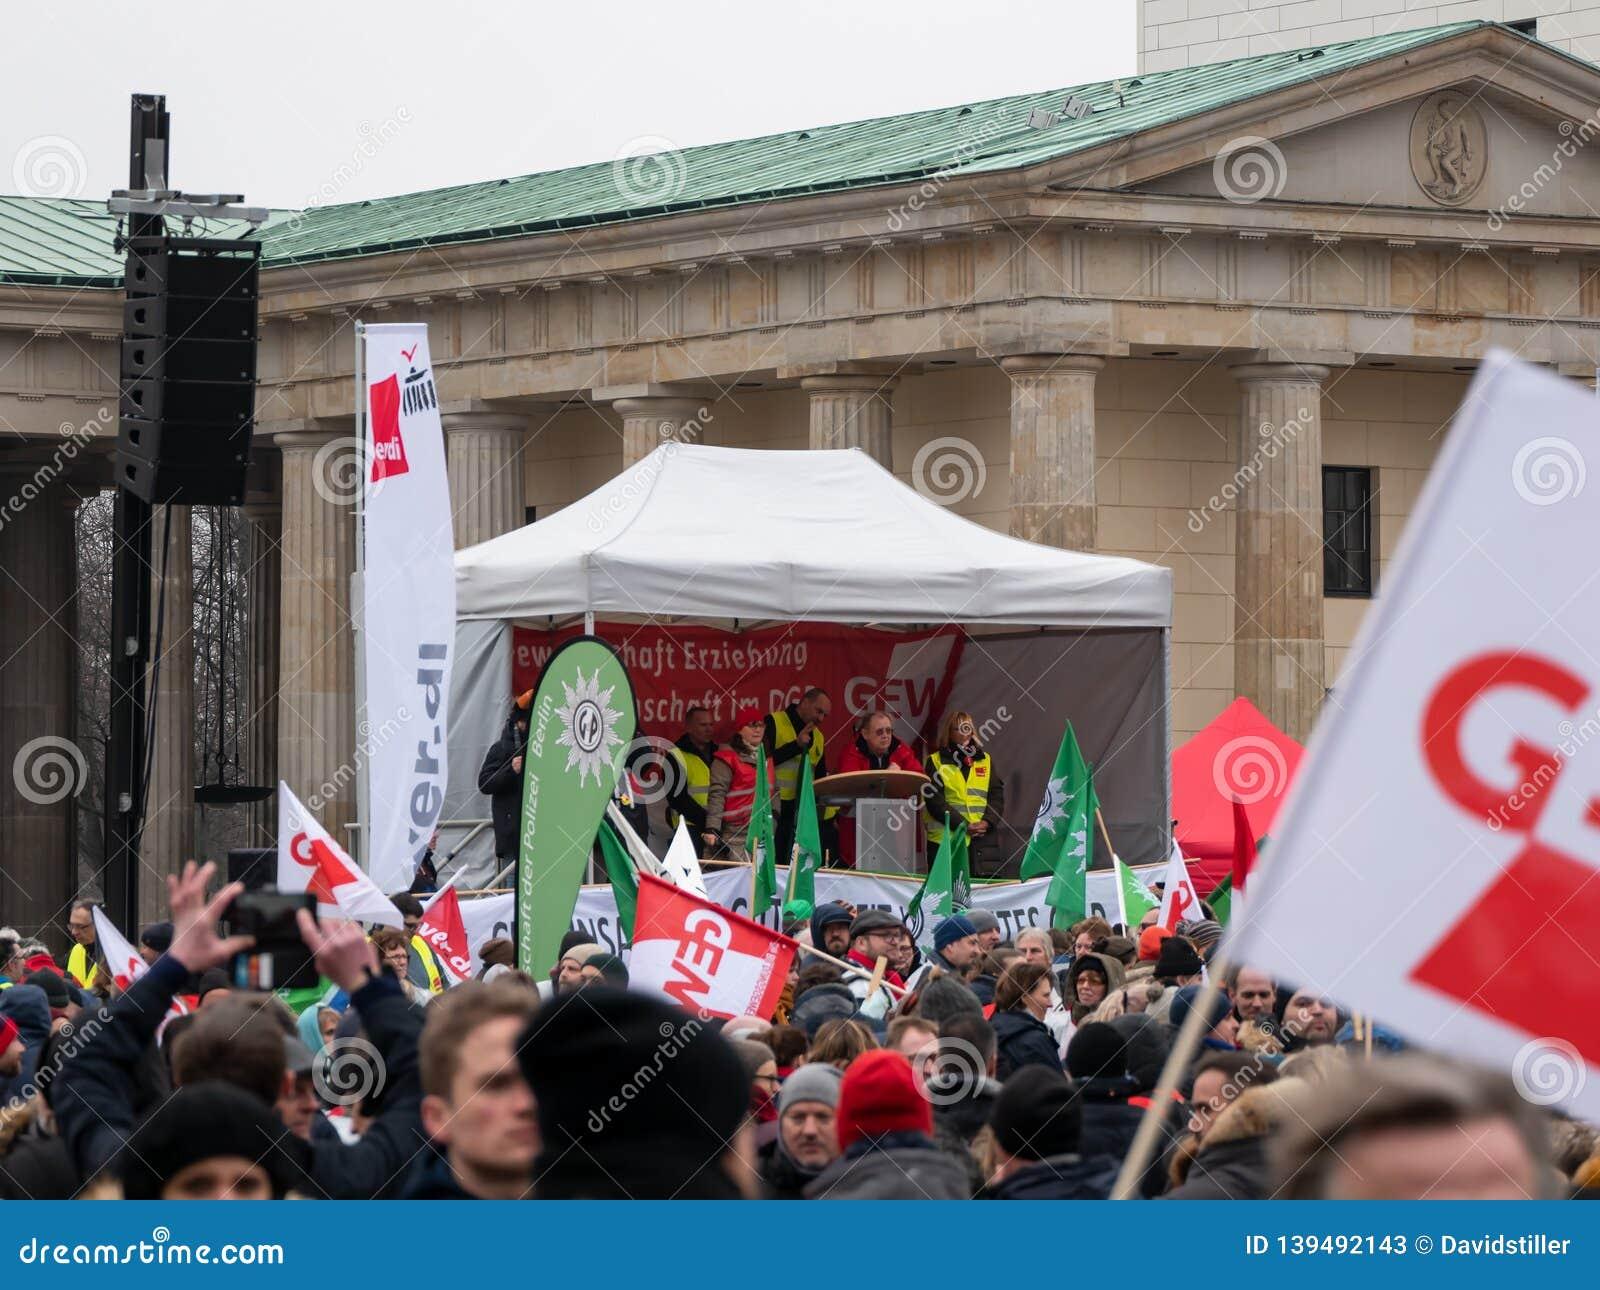 verdi union germany